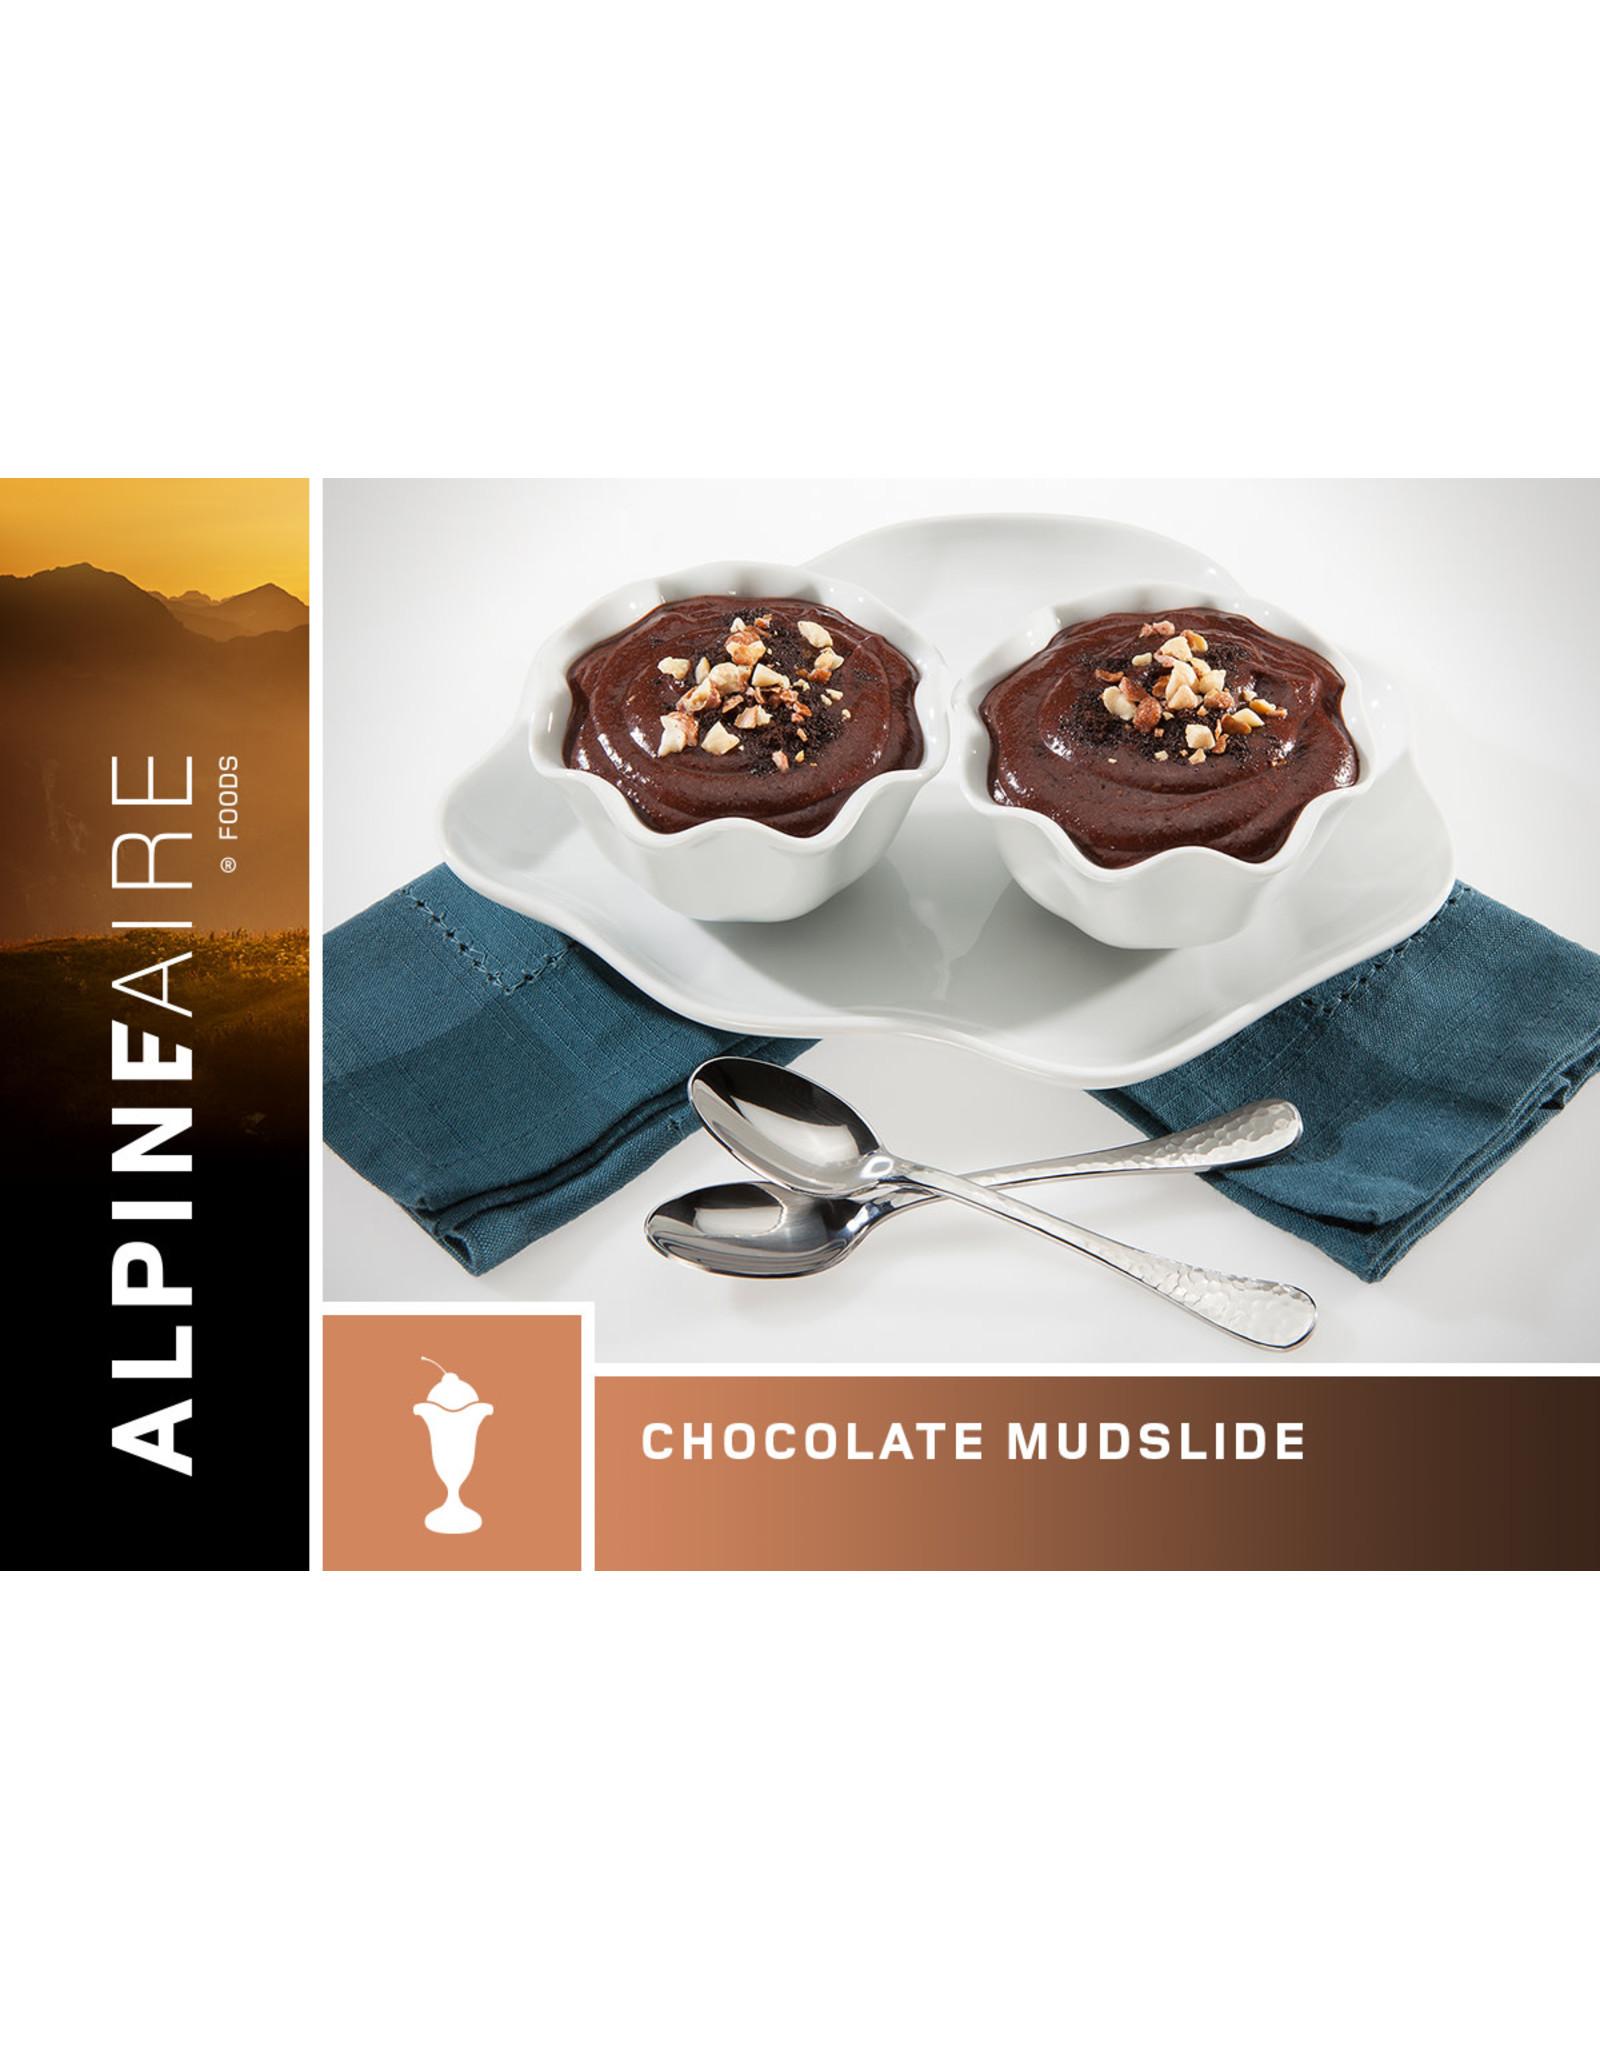 ALPINE FAIRE CHOCOLATE MUDSLIDE #60909